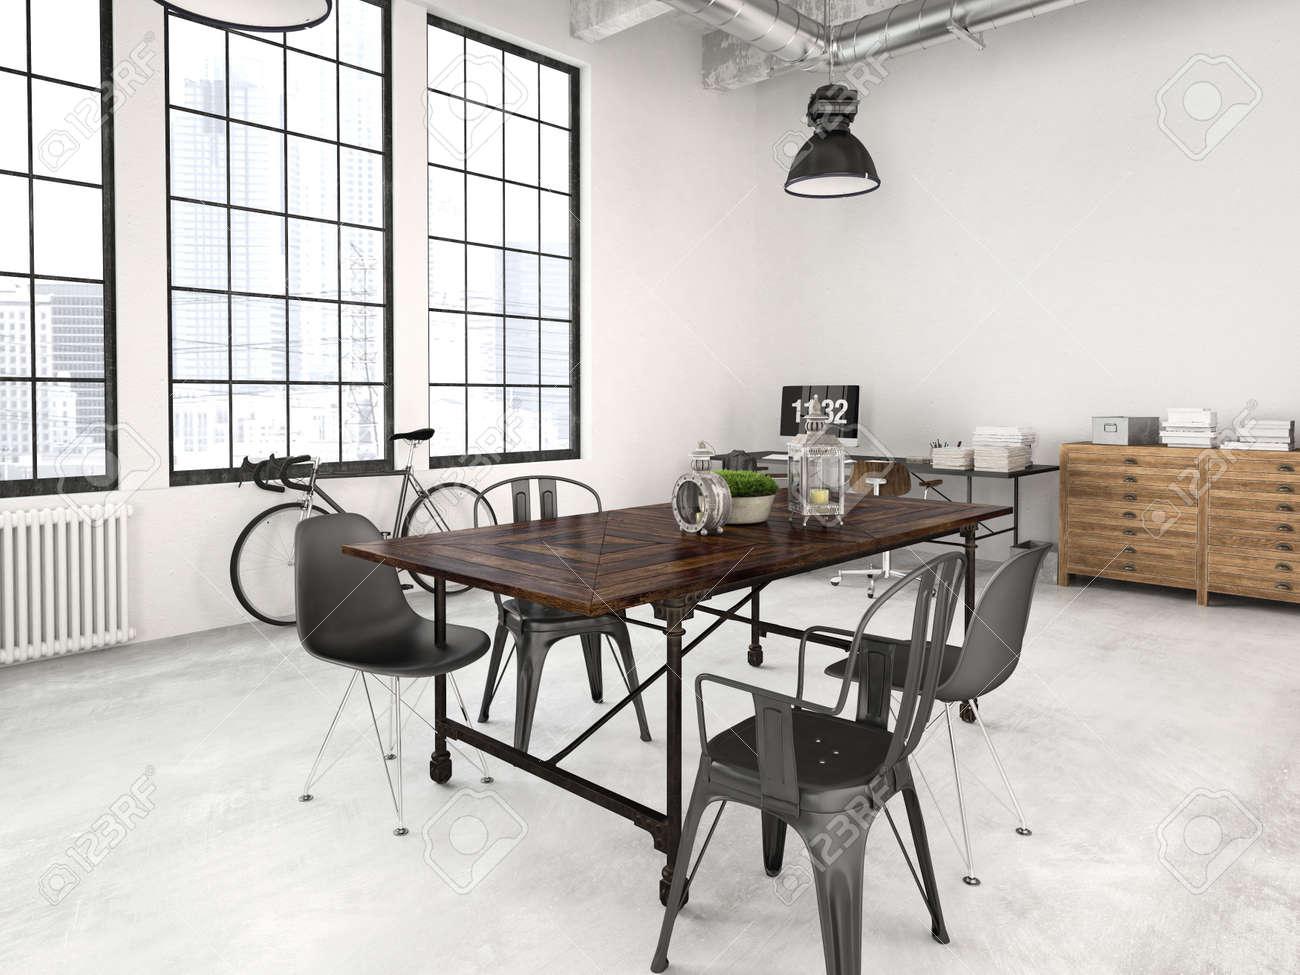 7db0b7fba1d 3d rendering of a modern industrial style loft Stock Photo - 47185812